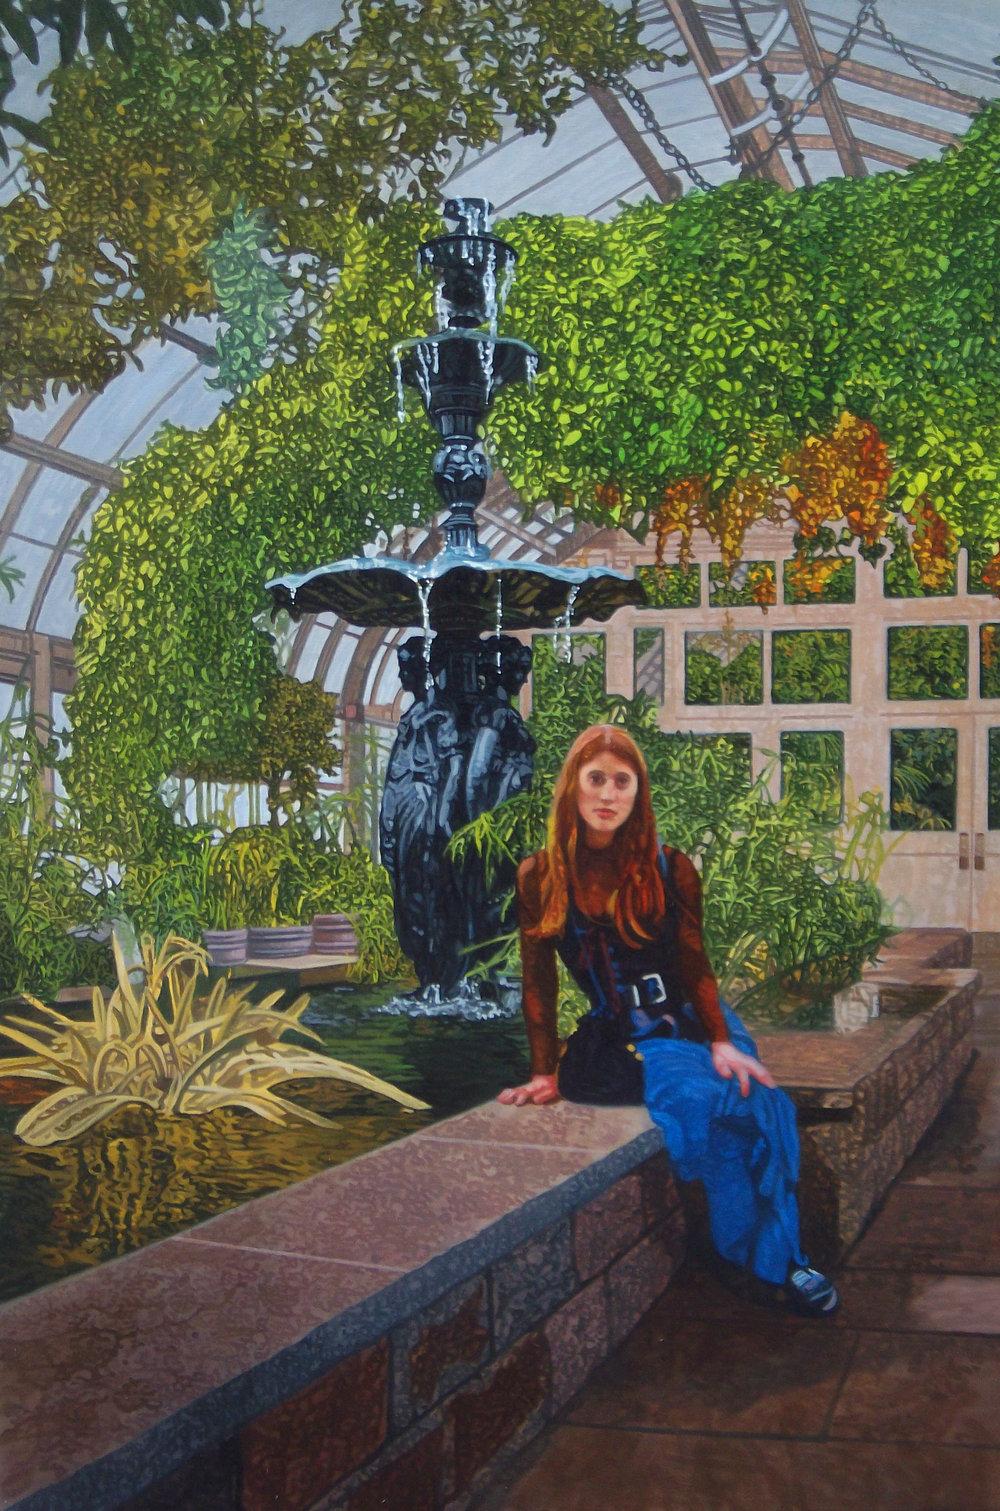 Eve in the Garden #2, Oil on Canvas, 36%22 x 24%22, 2016.jpg